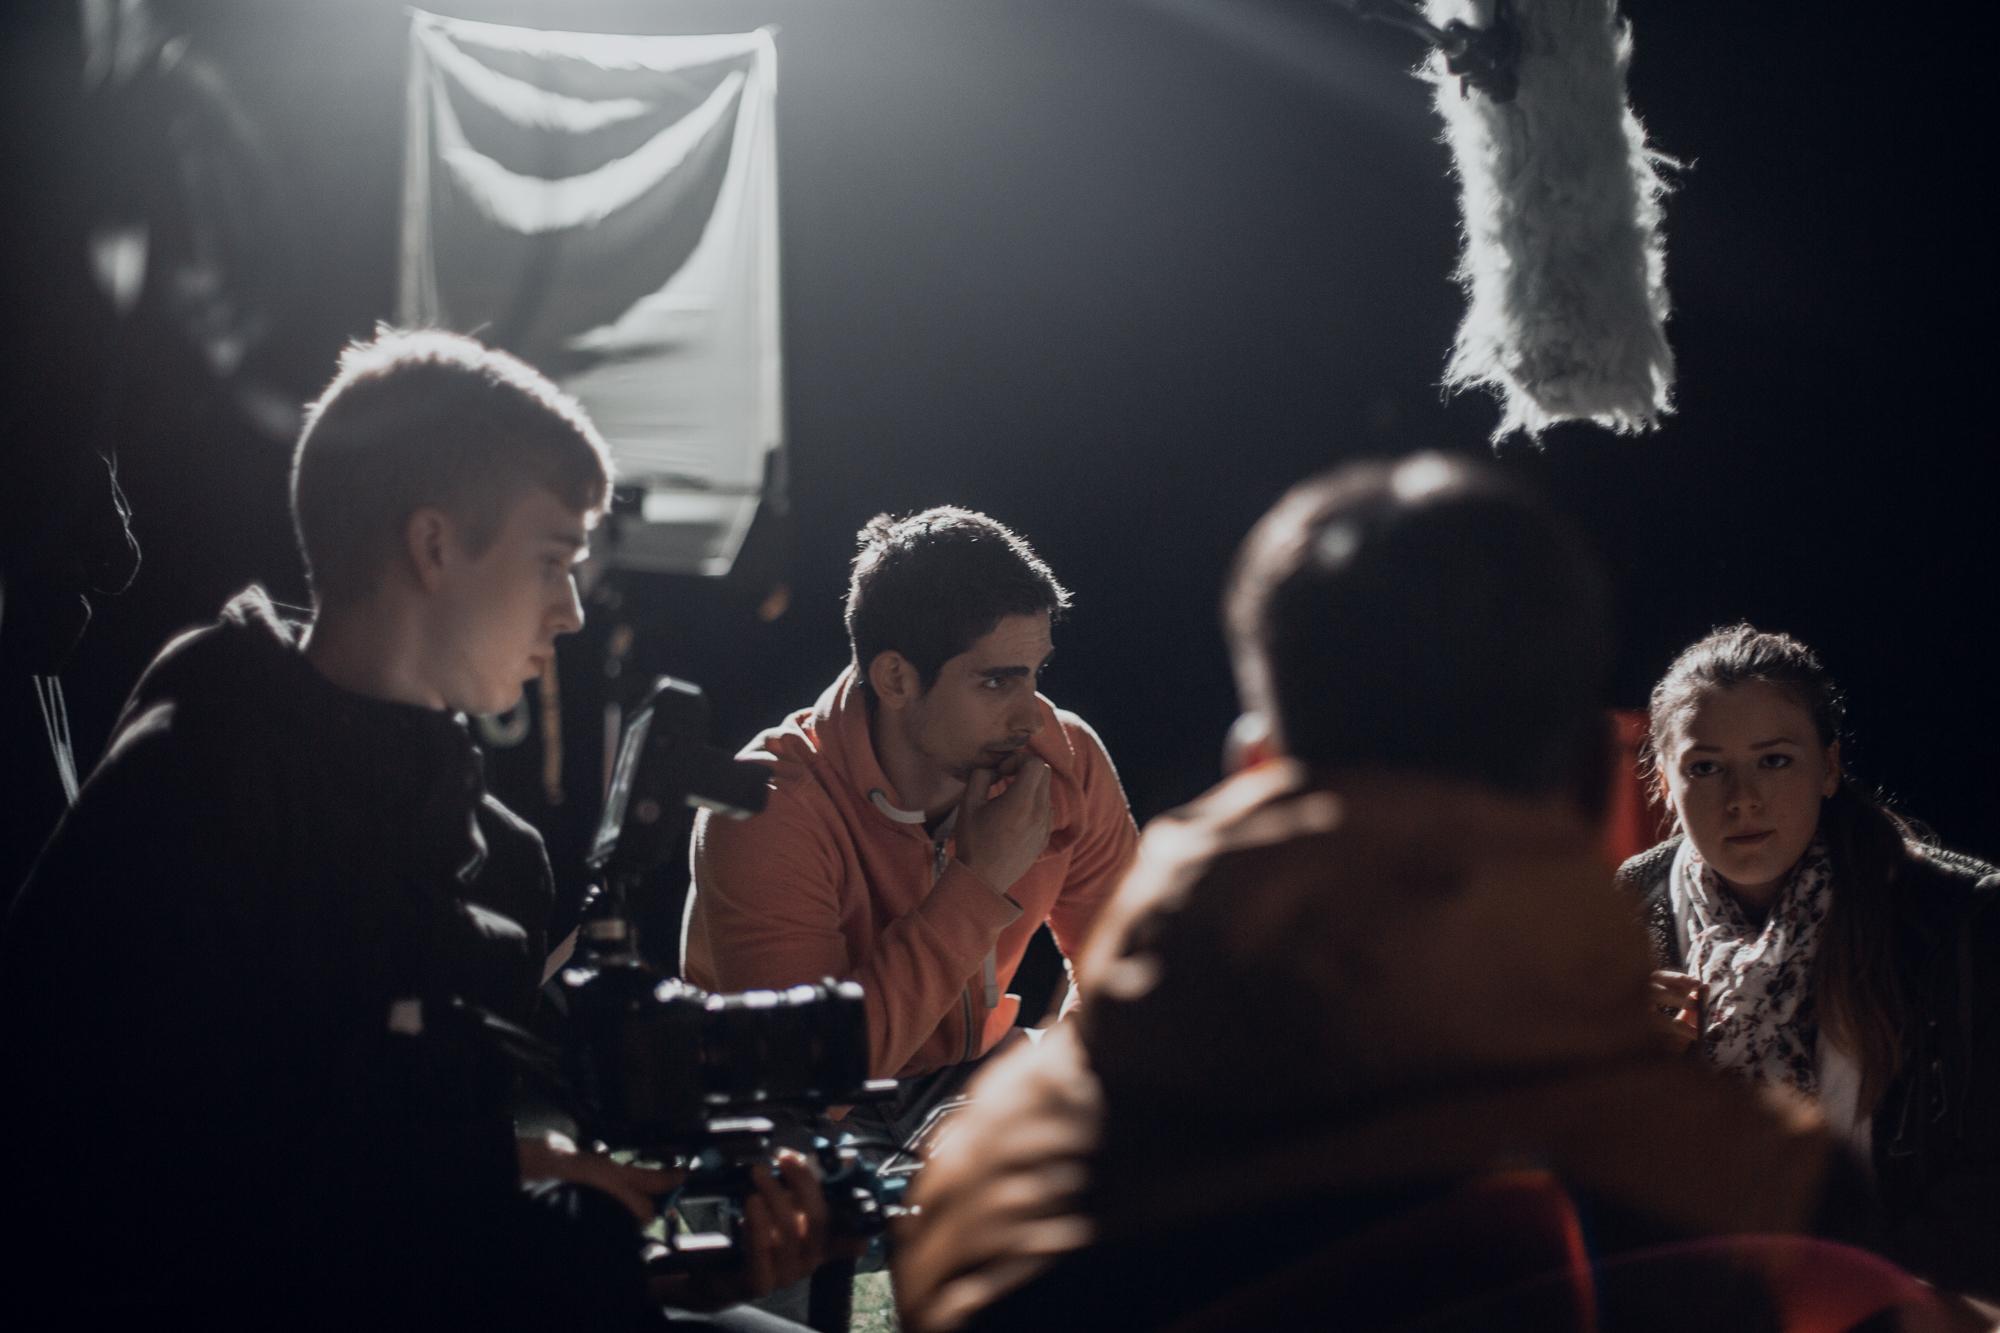 Imagefilme - Musikvideos - Kurzfilme